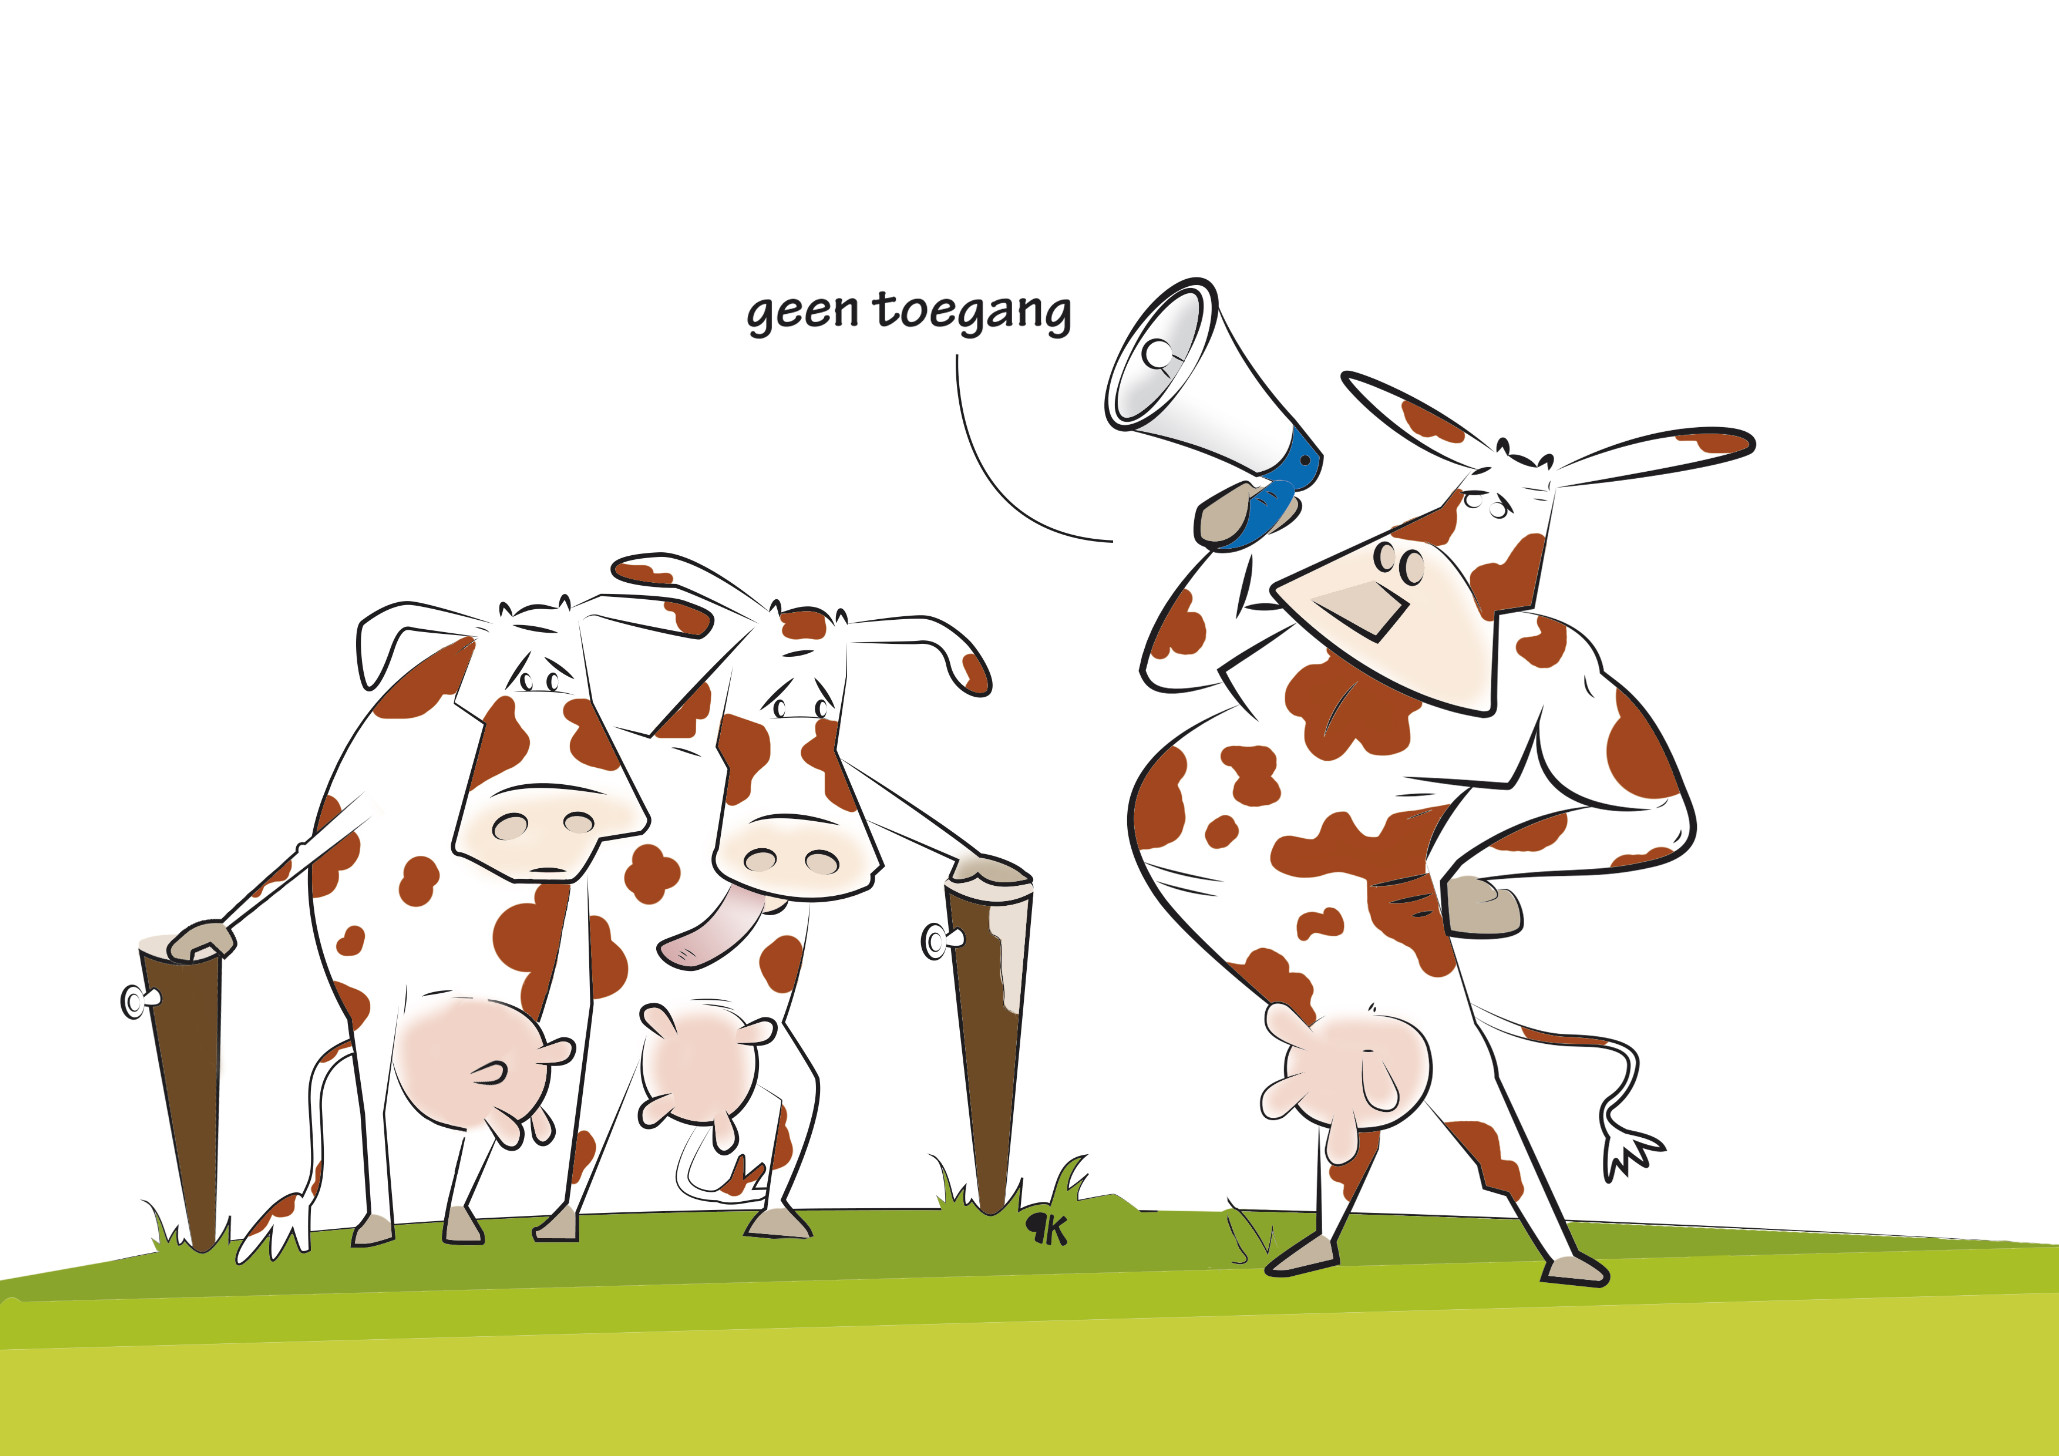 Minke 64 derde tweehonderdtonner van Nederland